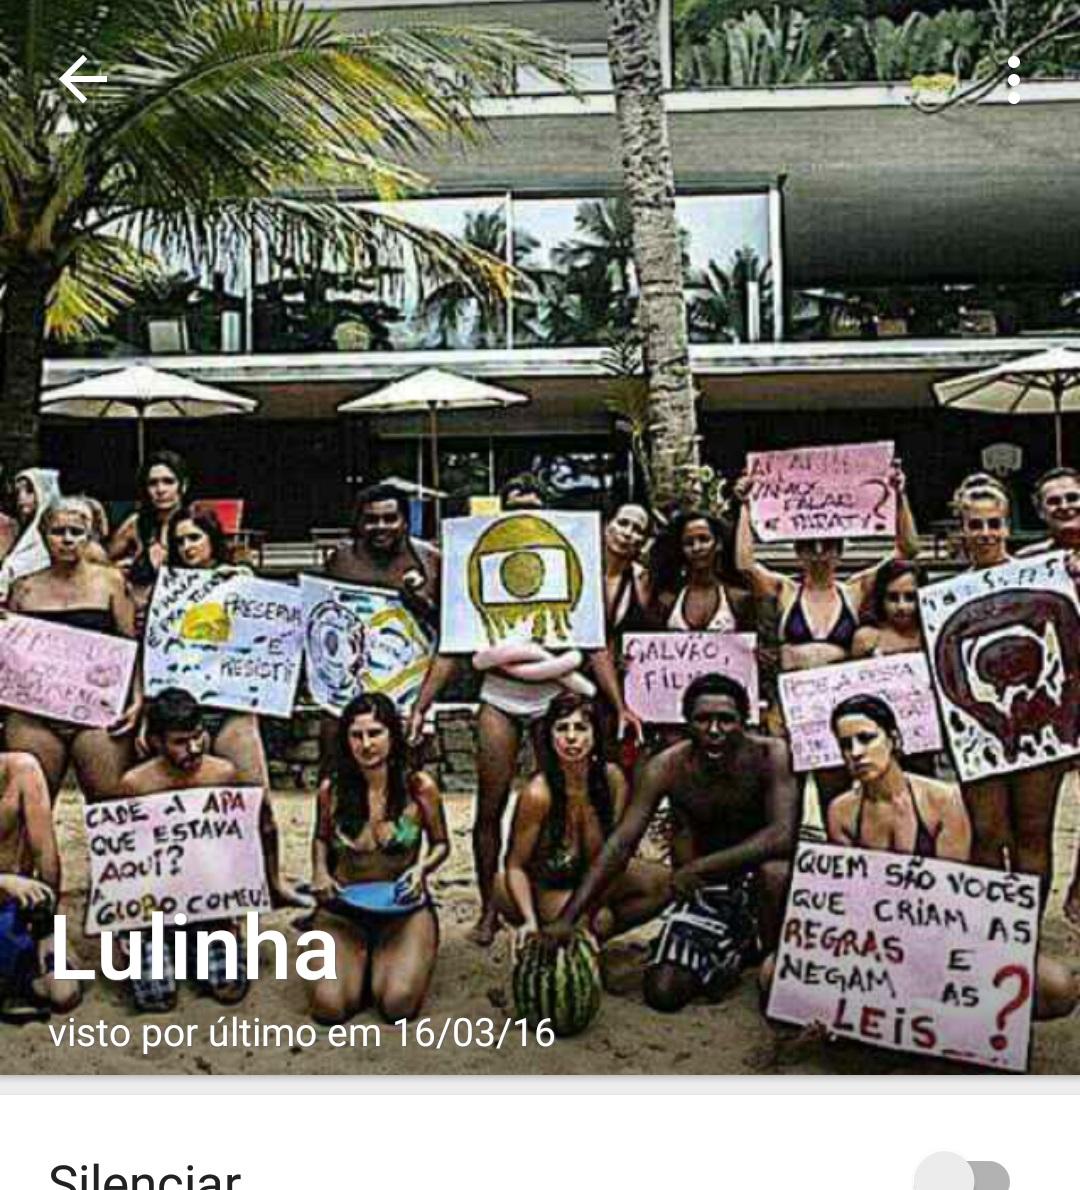 lulinha whatsapp 2